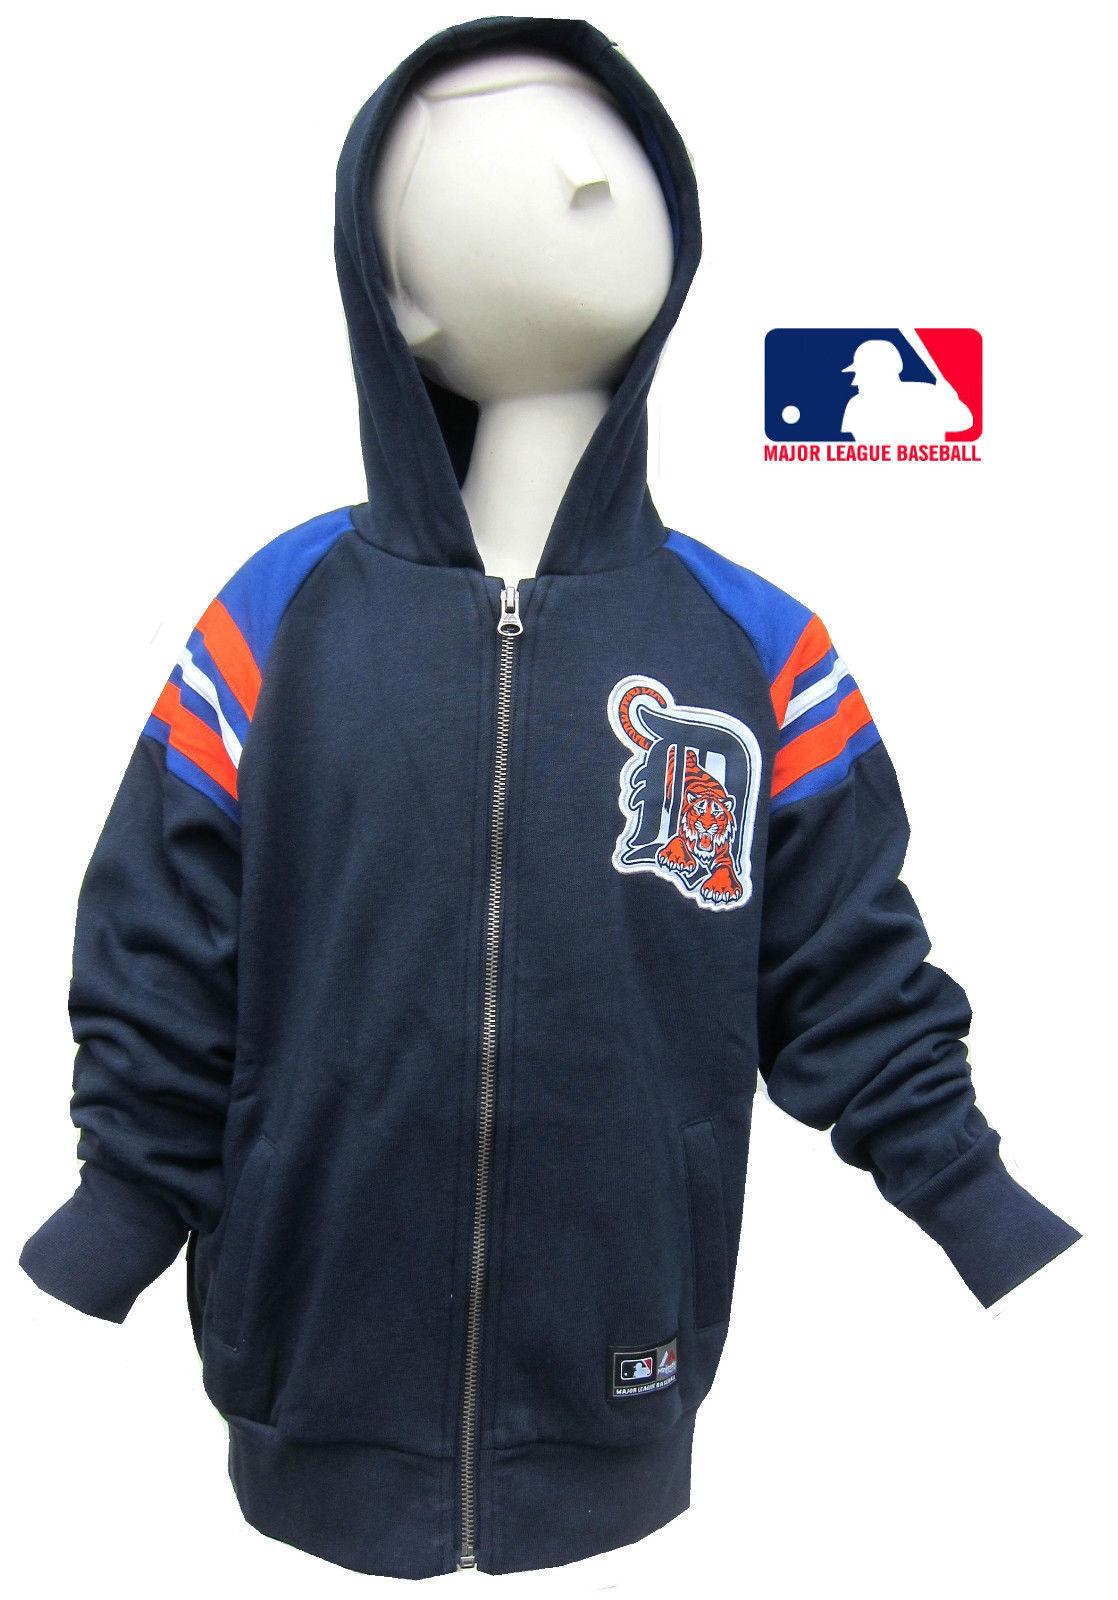 1b40fa393 Details about Detroit Tigers Boys/Girls Navy Blue Hoodie Major League  Baseball Hoody 8-15Y